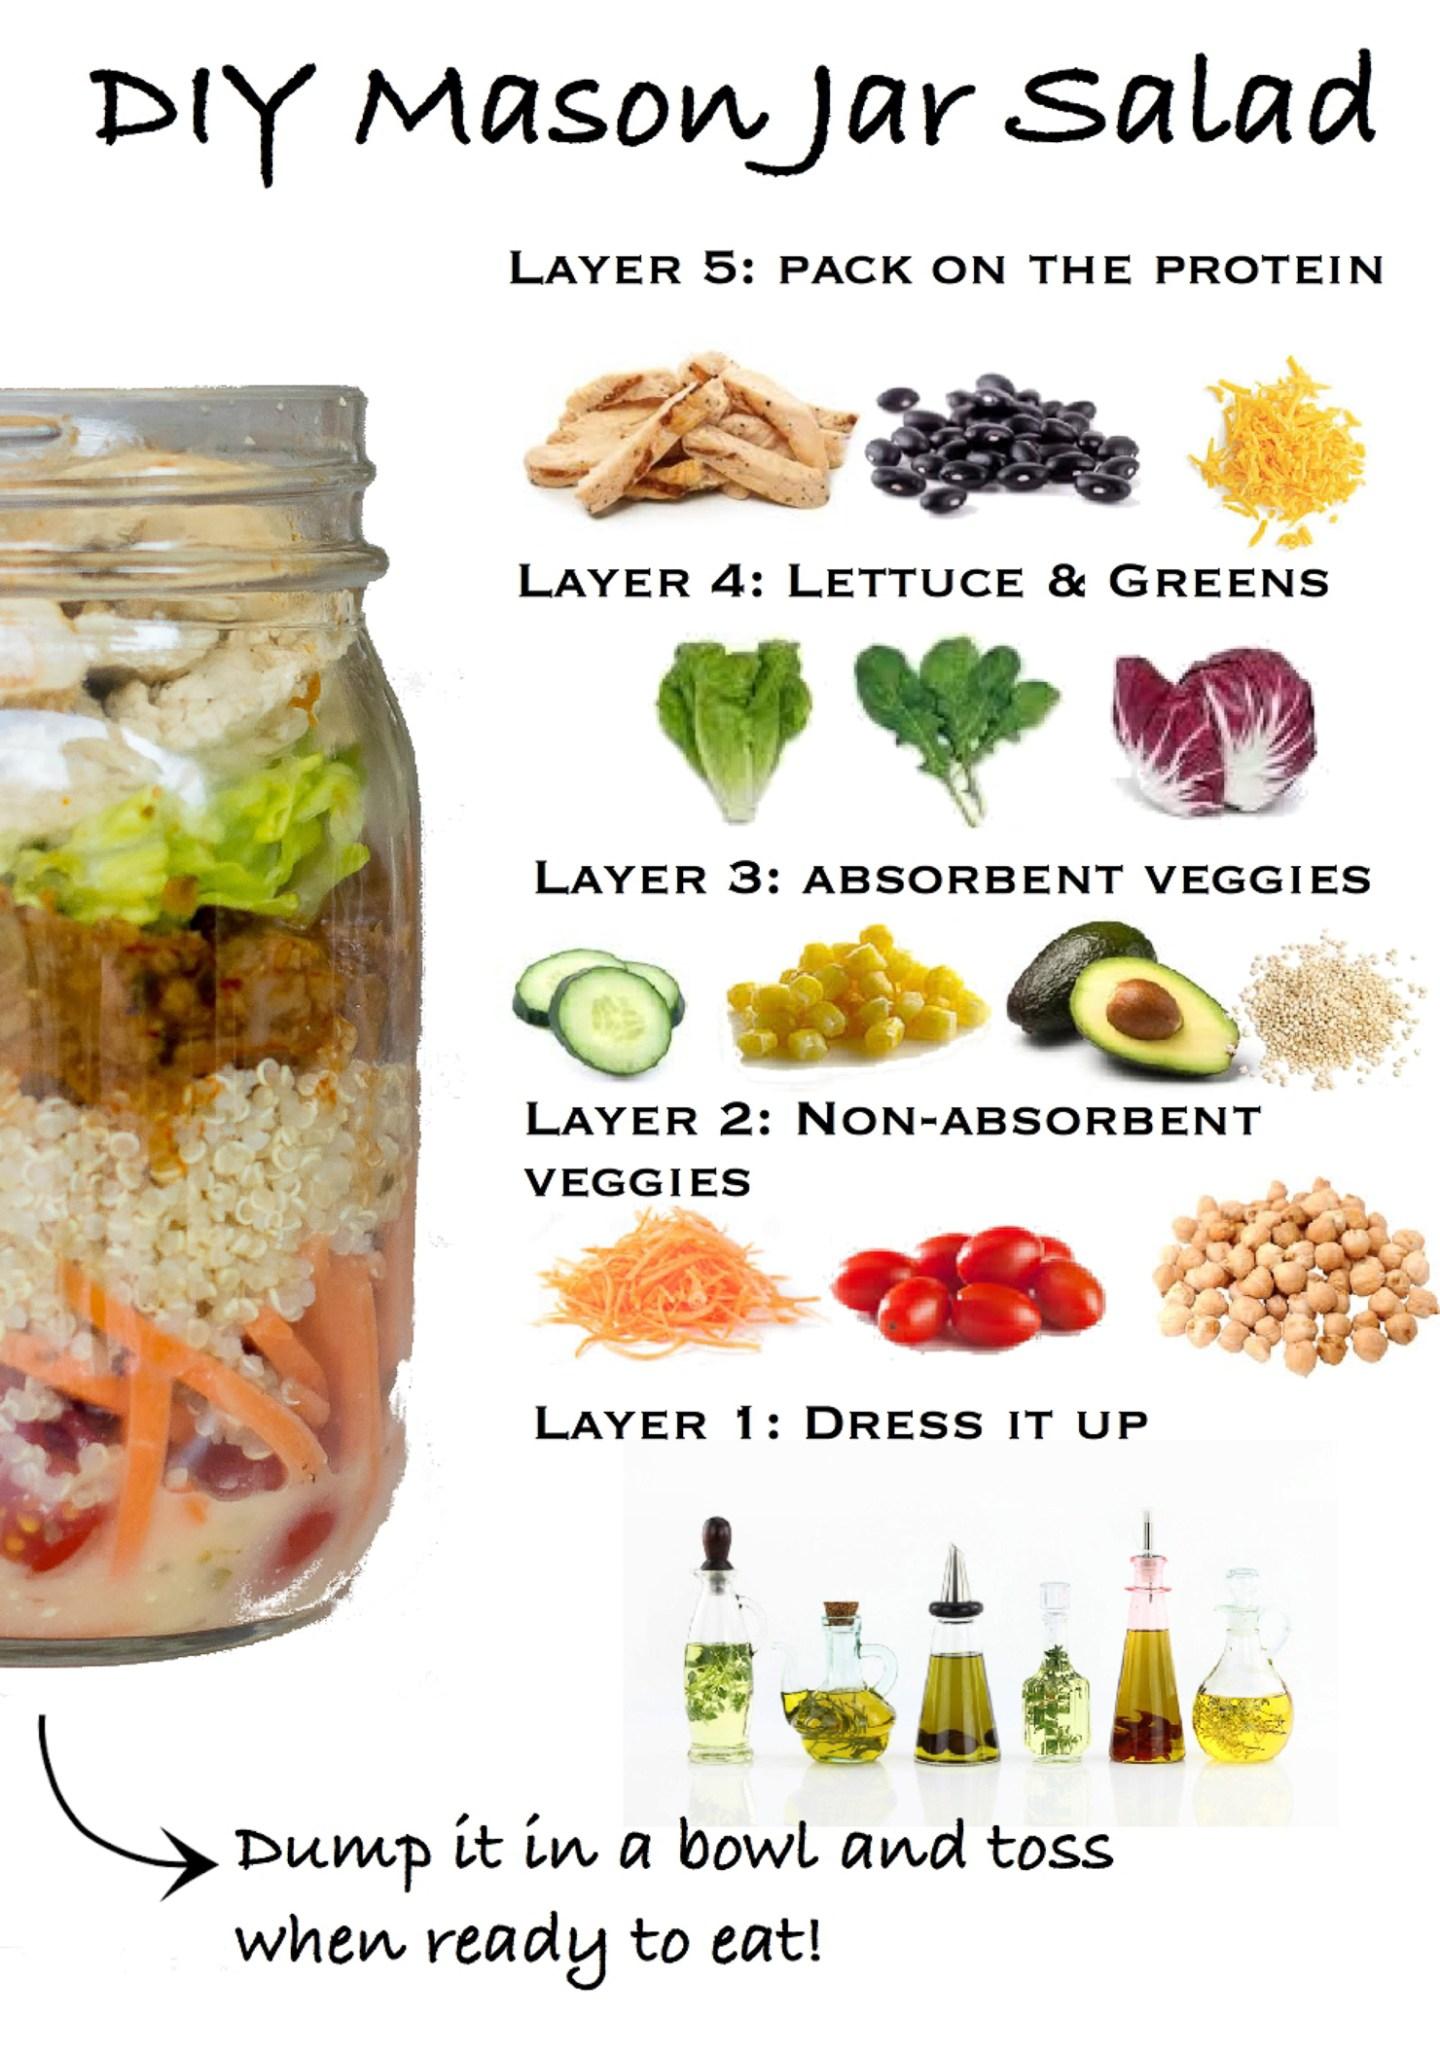 morning-star-diy-mason-jar-salad-meatless-lunch-idea